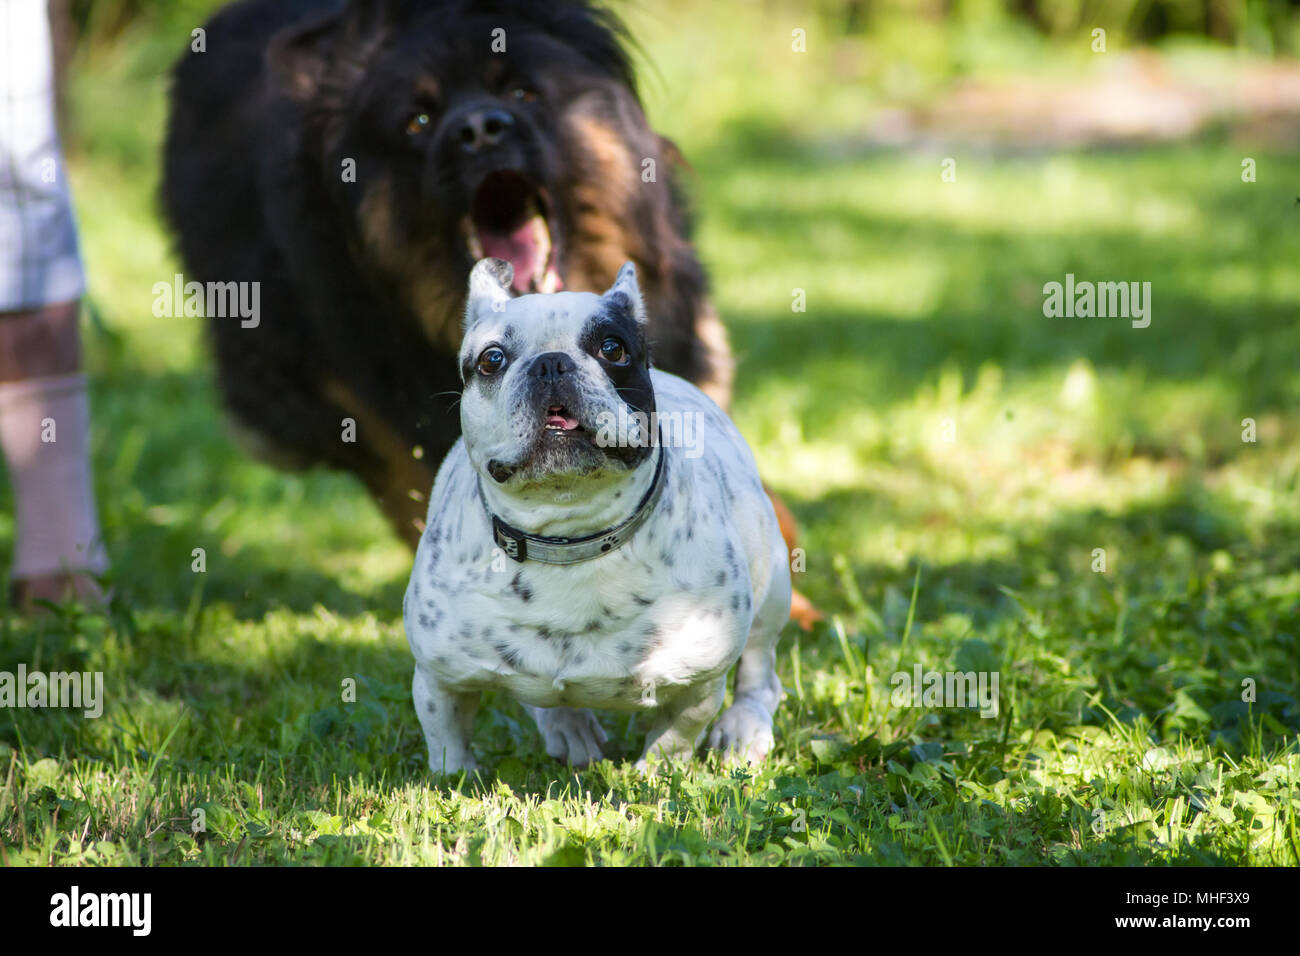 Bianco Nero Pezzati Bulldog Francese Cane Femmina In Una Giornata Di